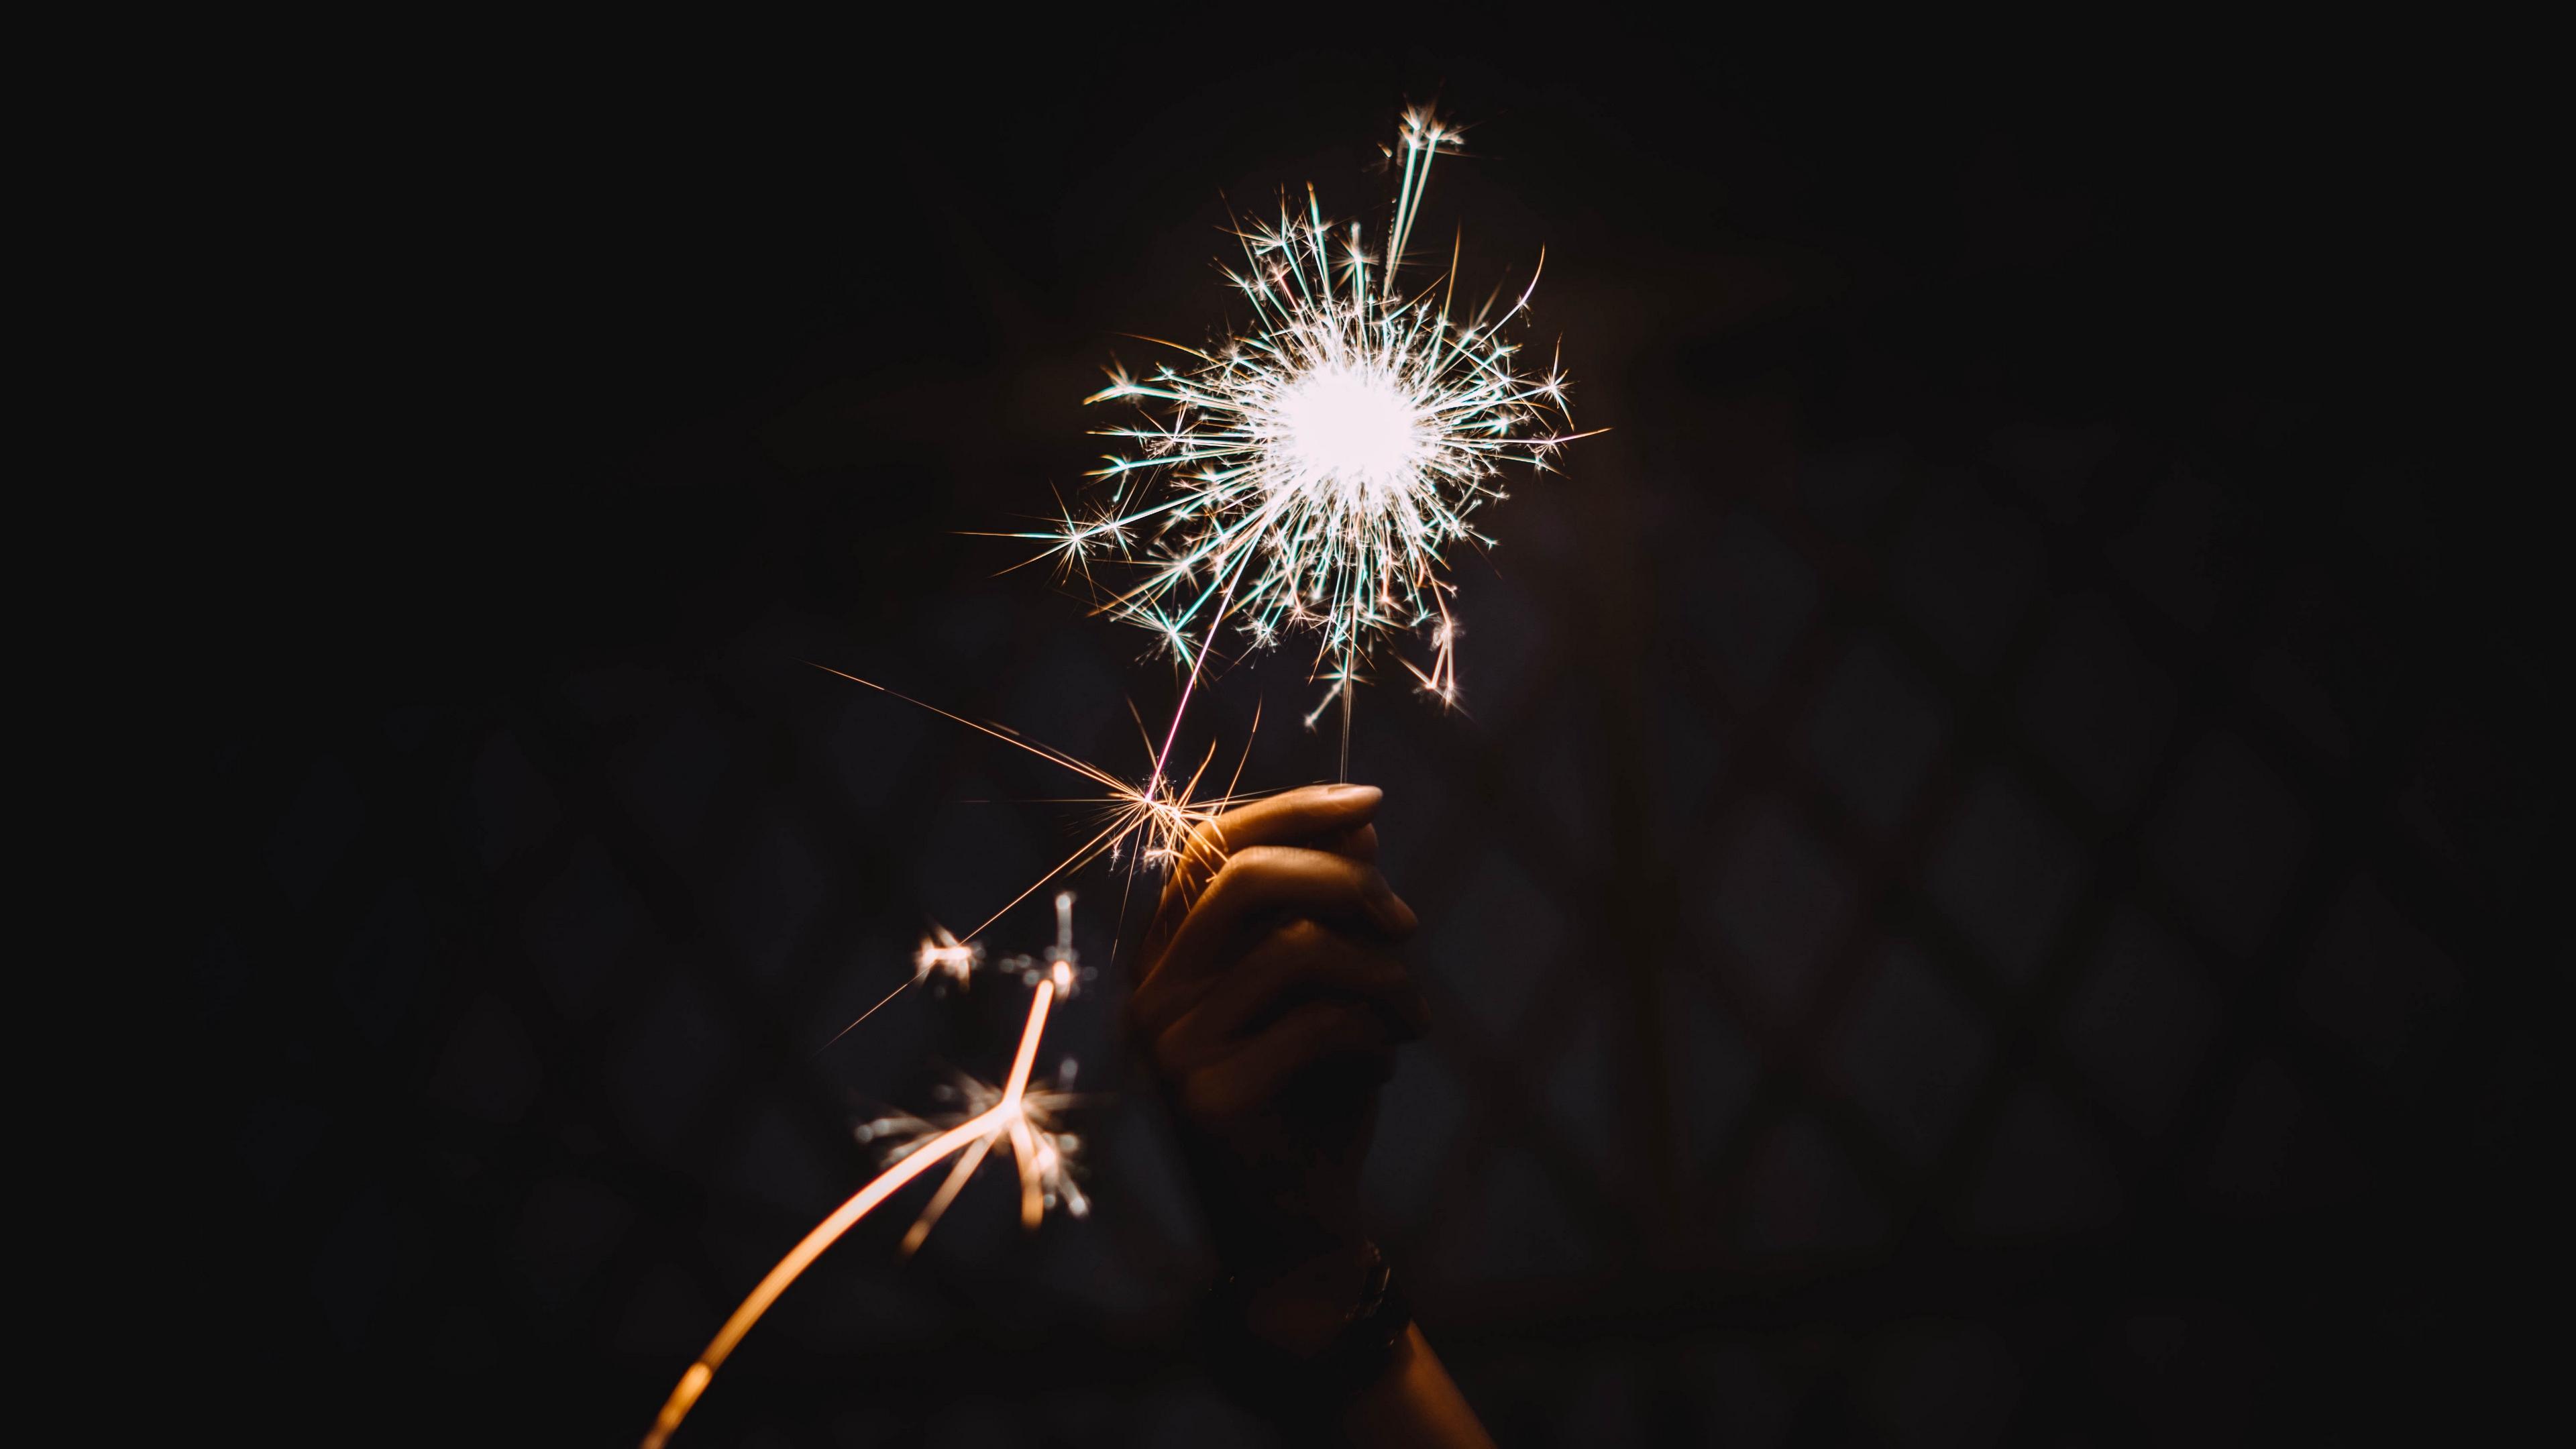 bengali fire sparks holiday hand 4k 1538344777 - bengali fire, sparks, holiday, hand 4k - Sparks, Holiday, bengali fire